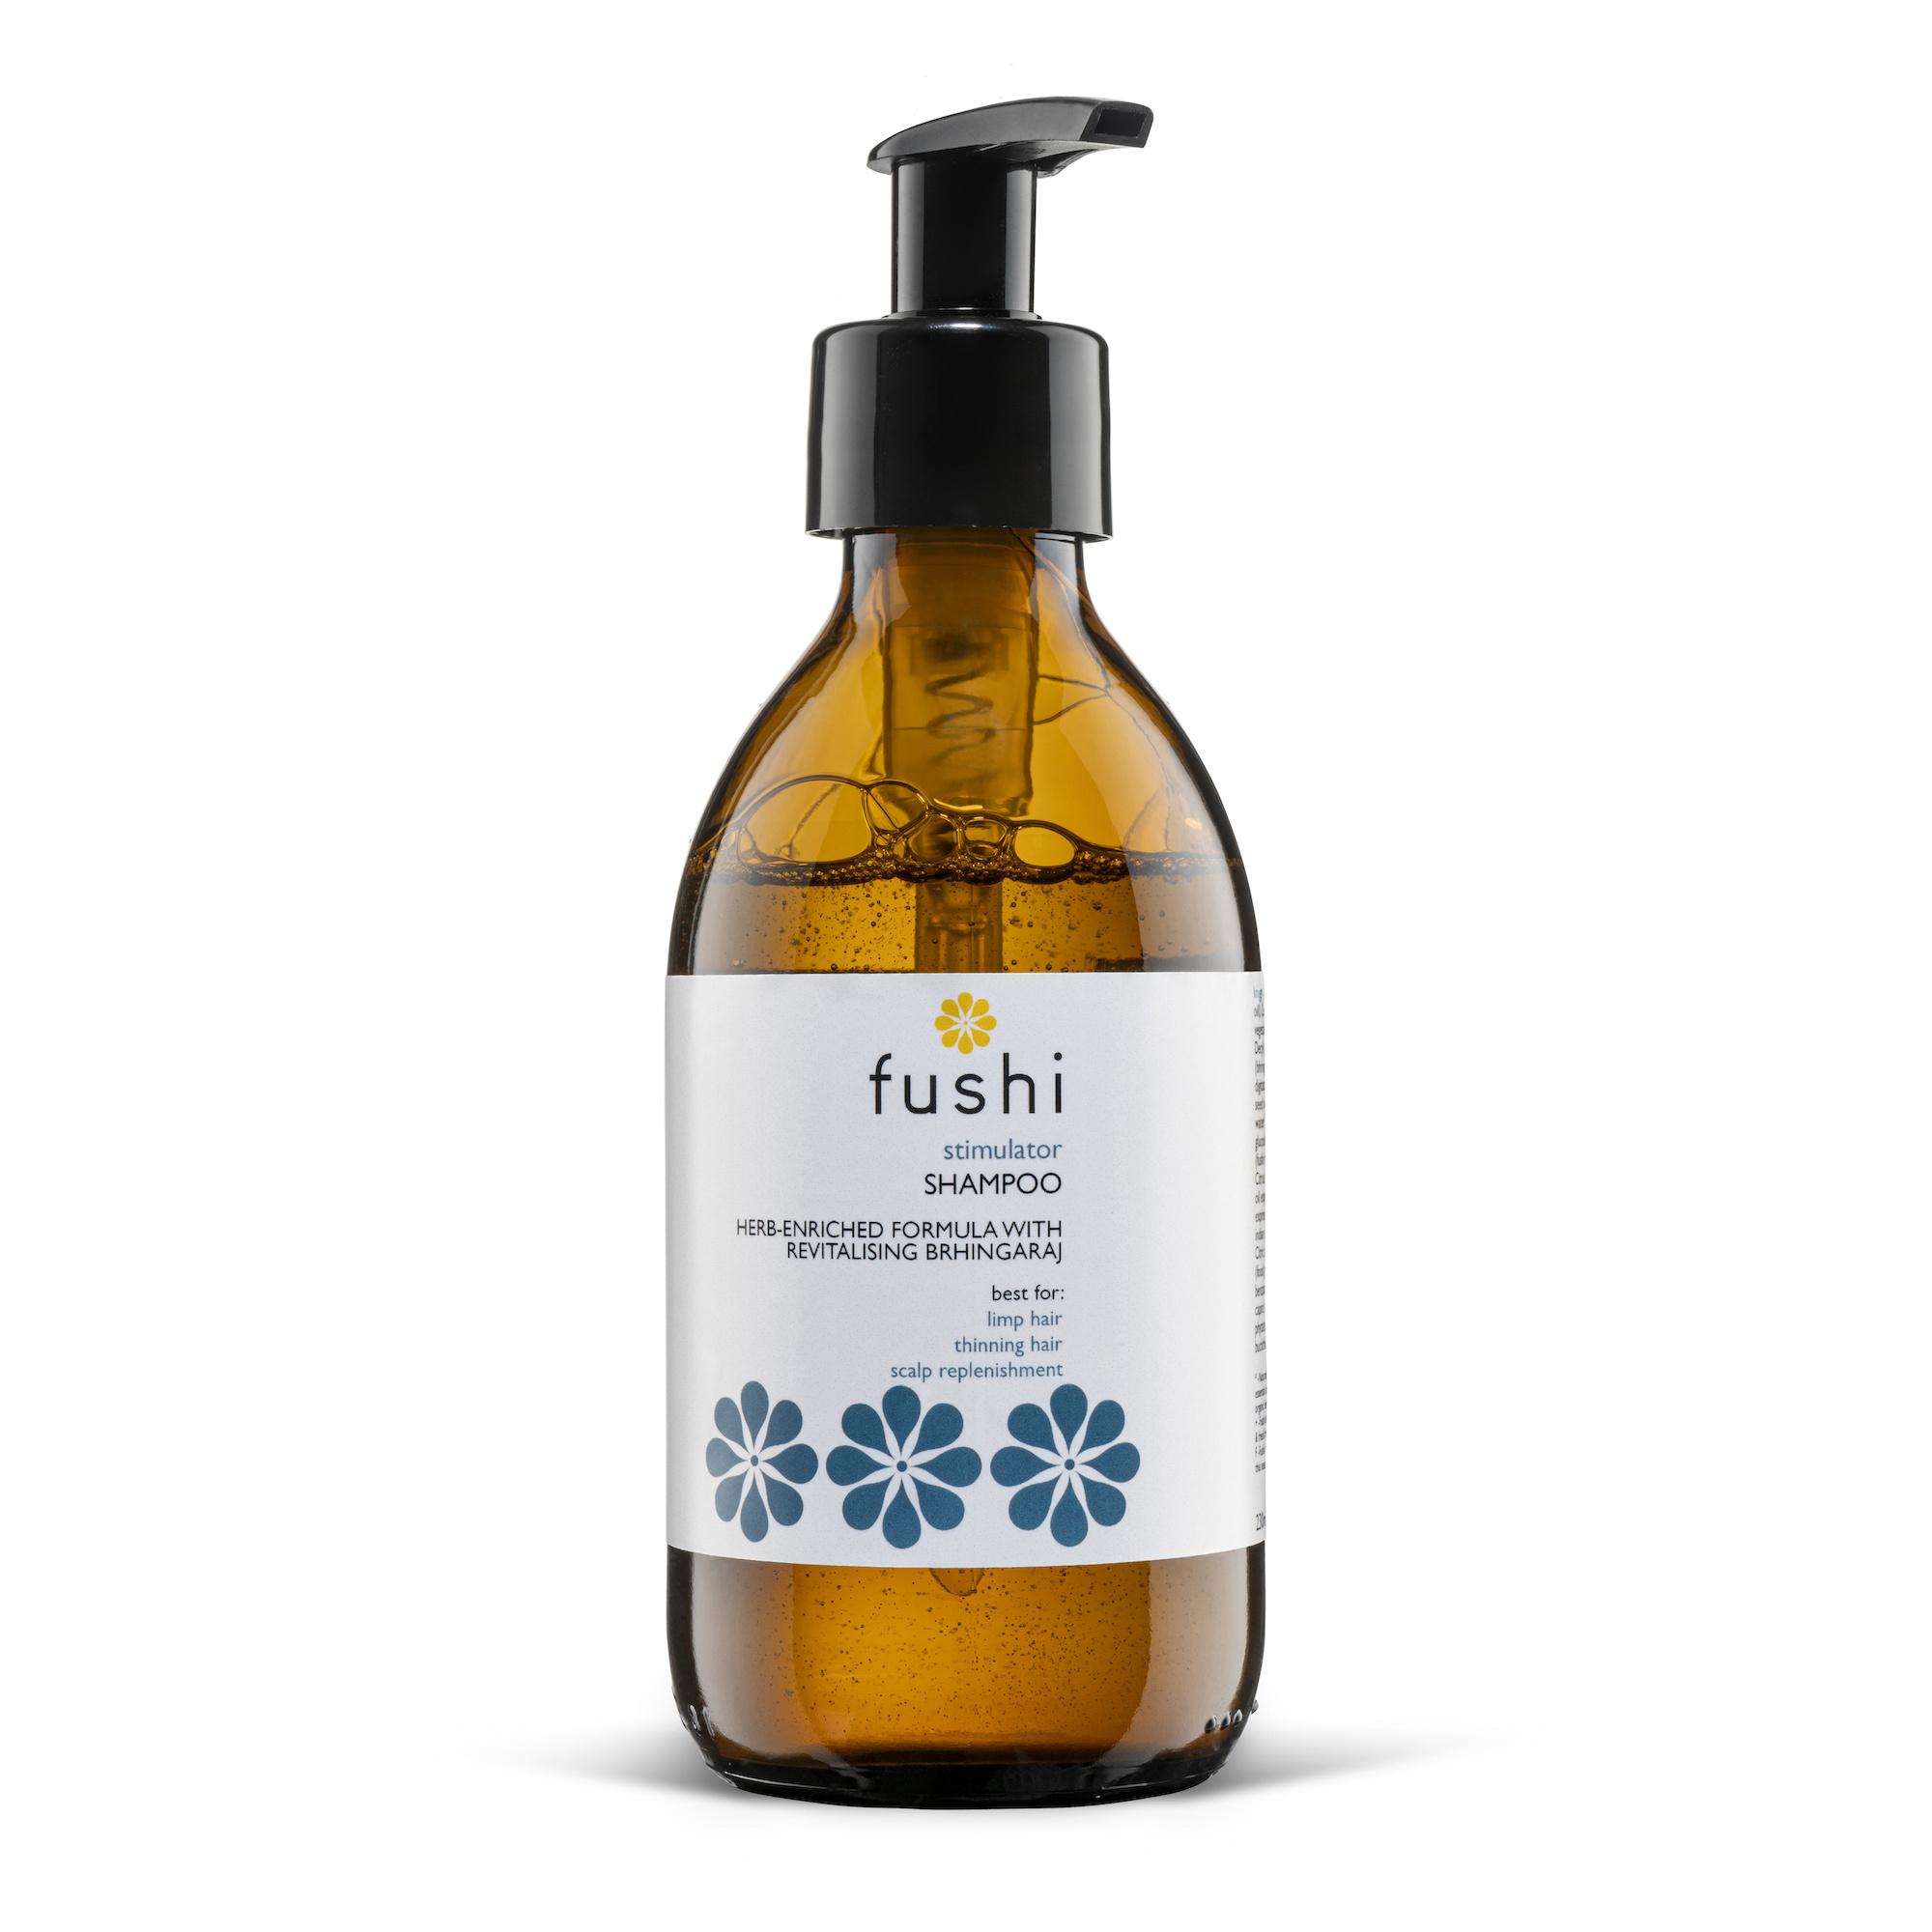 FUSHI - Stimulator Herbal Shampoo - 230ml & 470ml